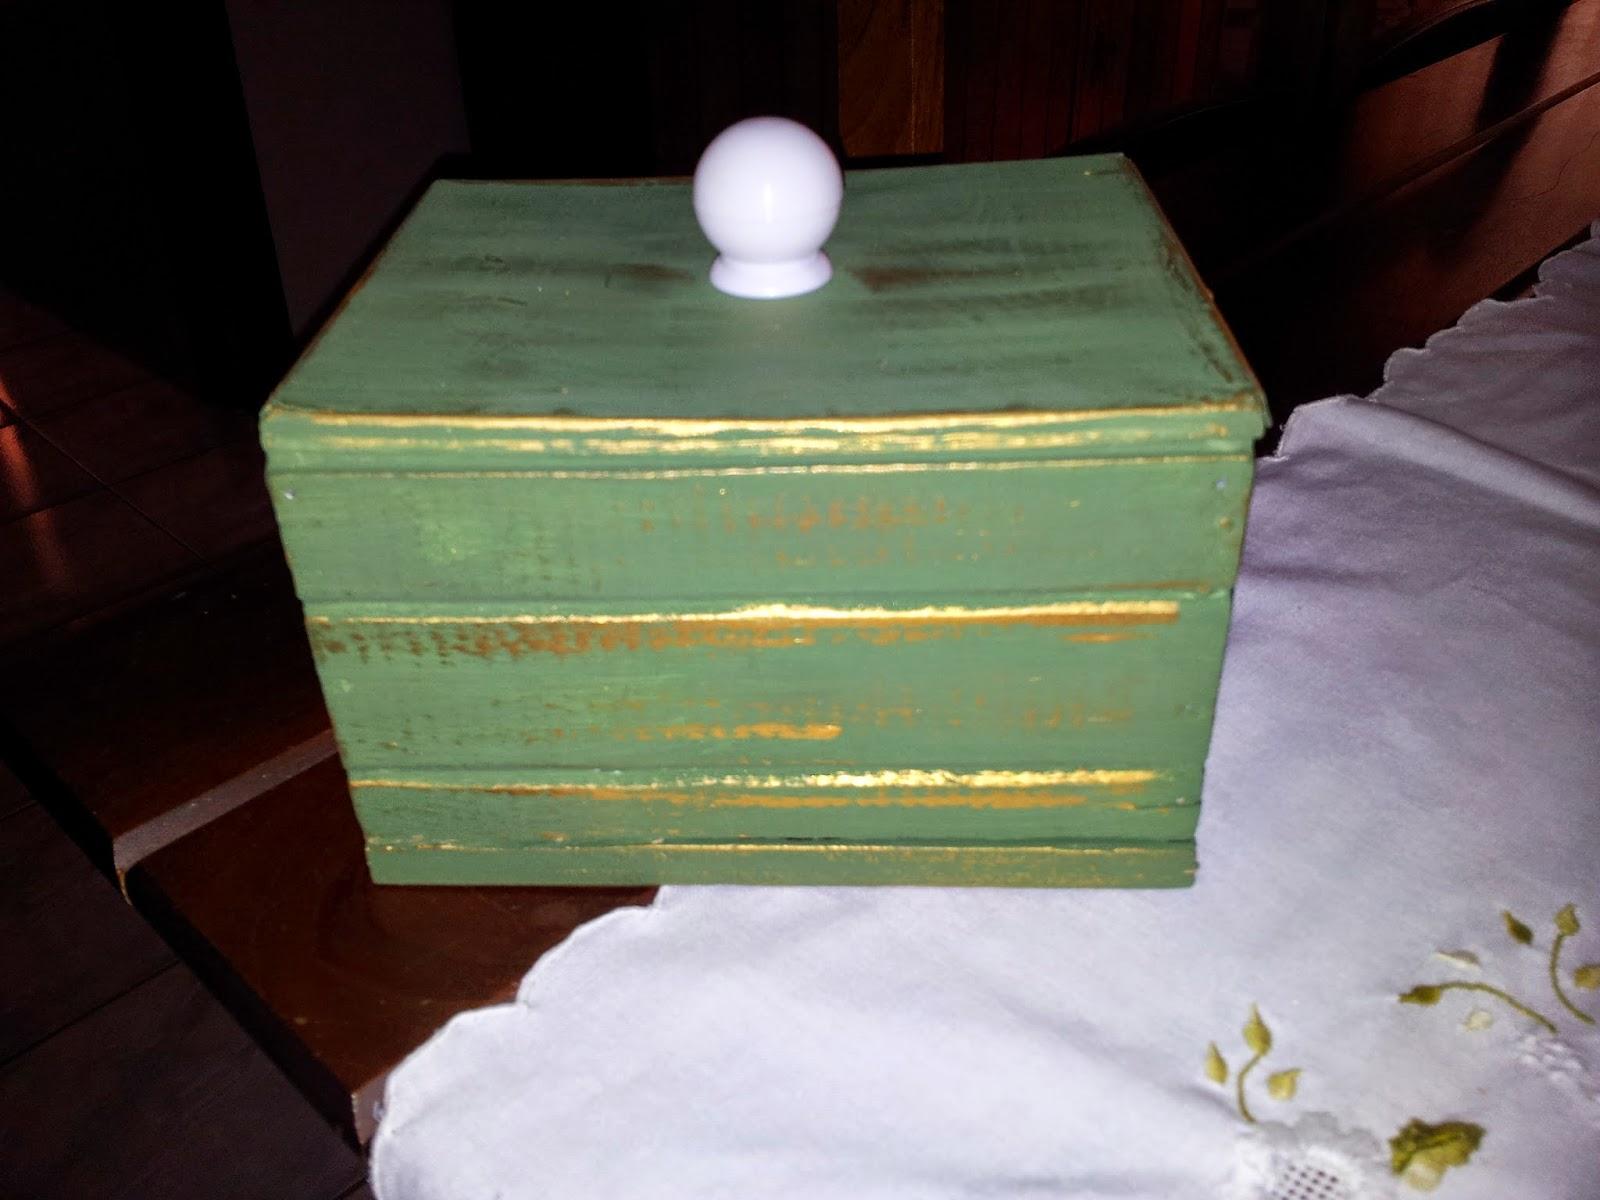 de tinta e pincéis de cavaletes de pintura e um cabide de madeira #948837 1600x1200